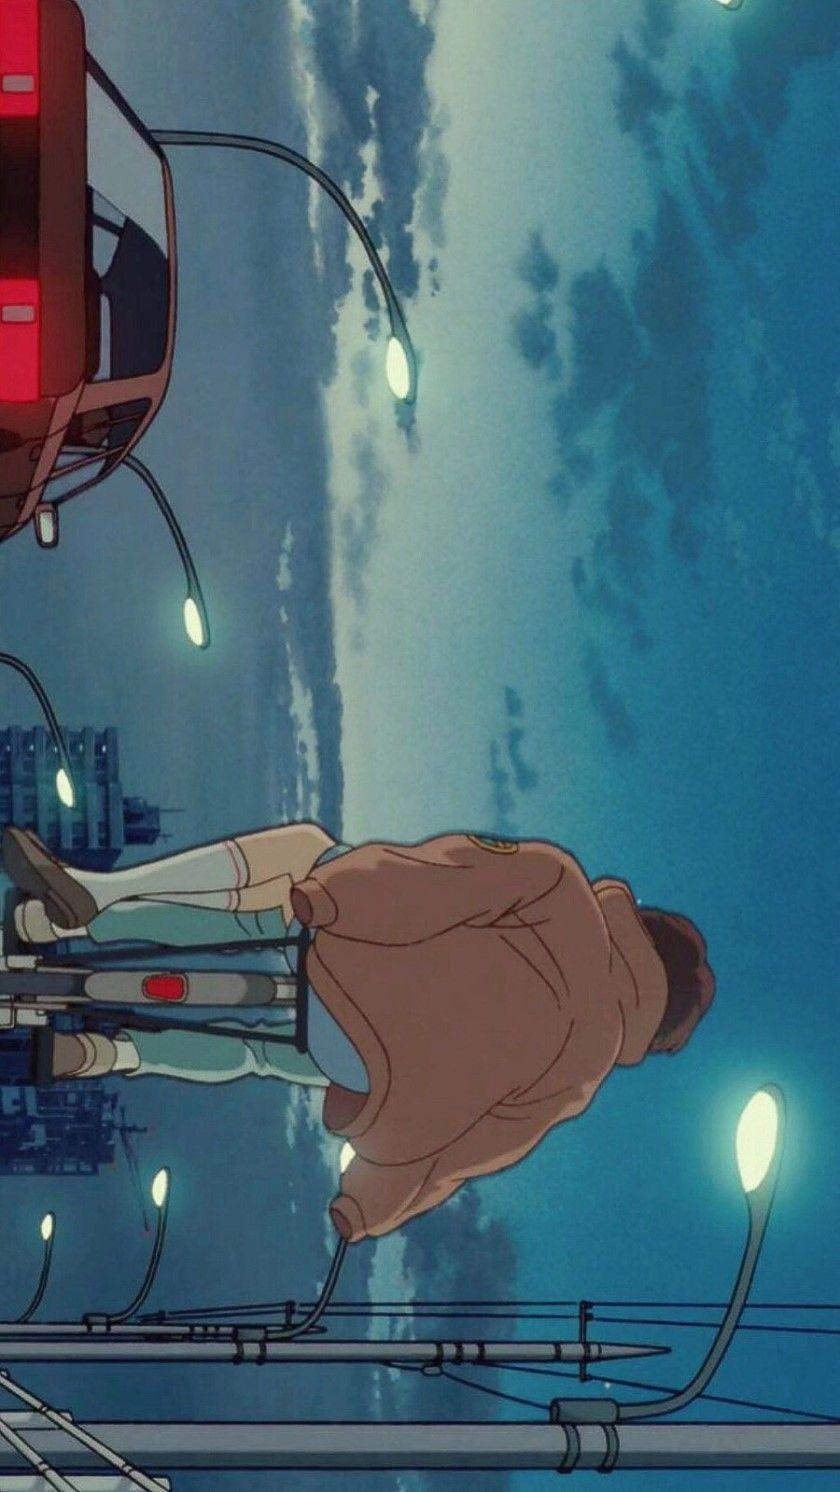 Retro 90s Anime Aesthetic : retro, anime, aesthetic, Anime, Wallpapers, Backgrounds, WallpaperAccess